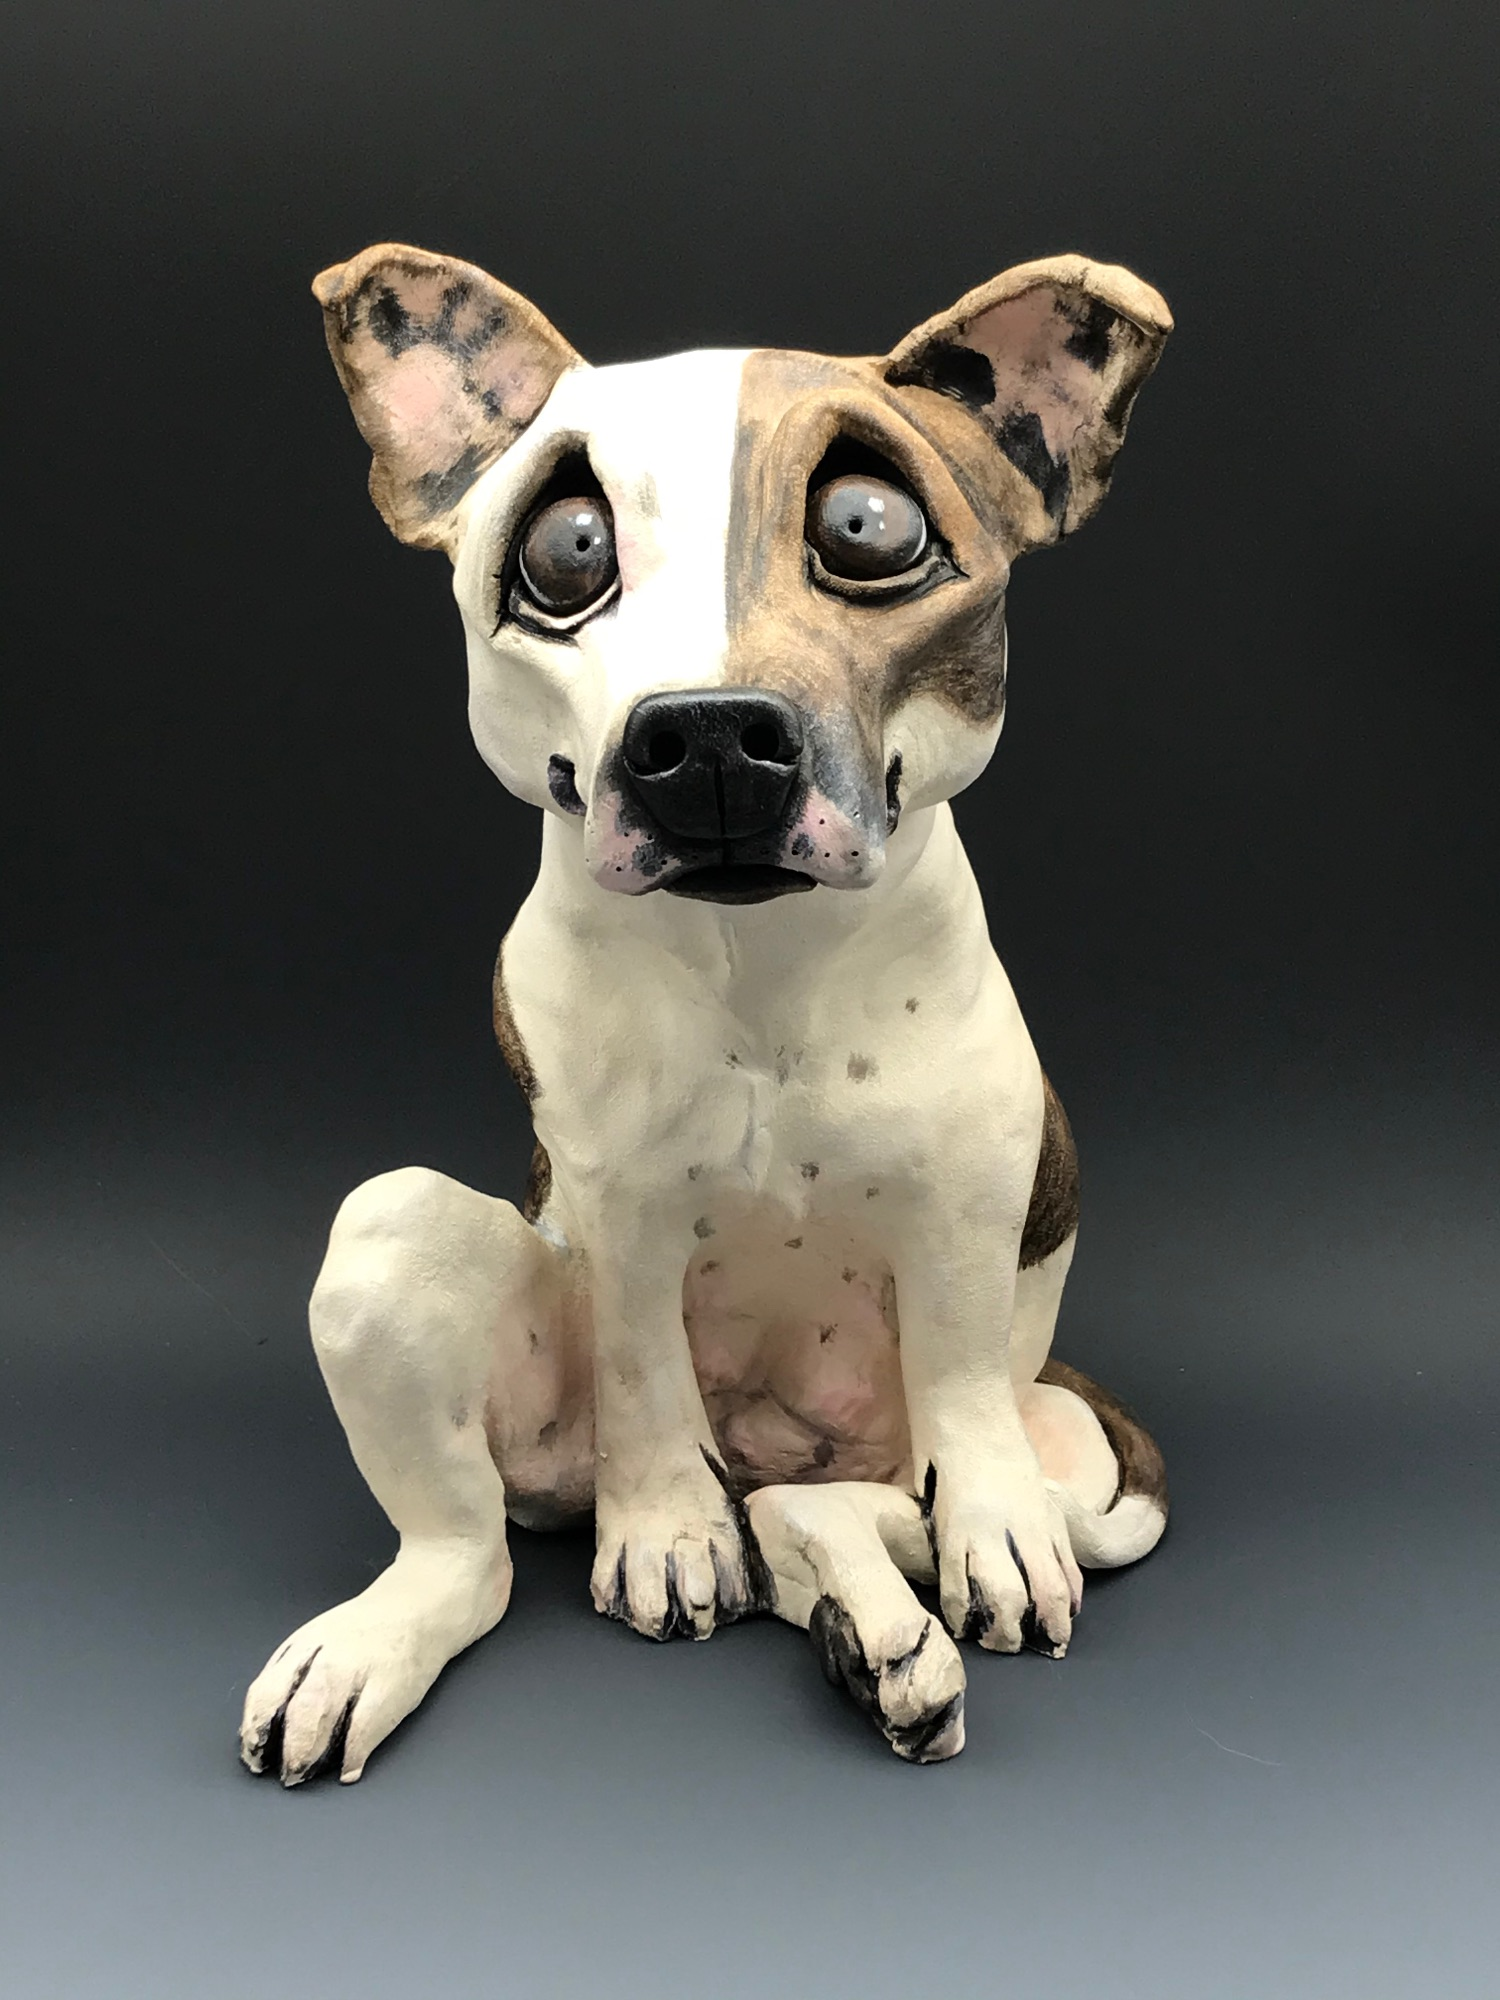 Staffy Dog Sculpture Ceramic